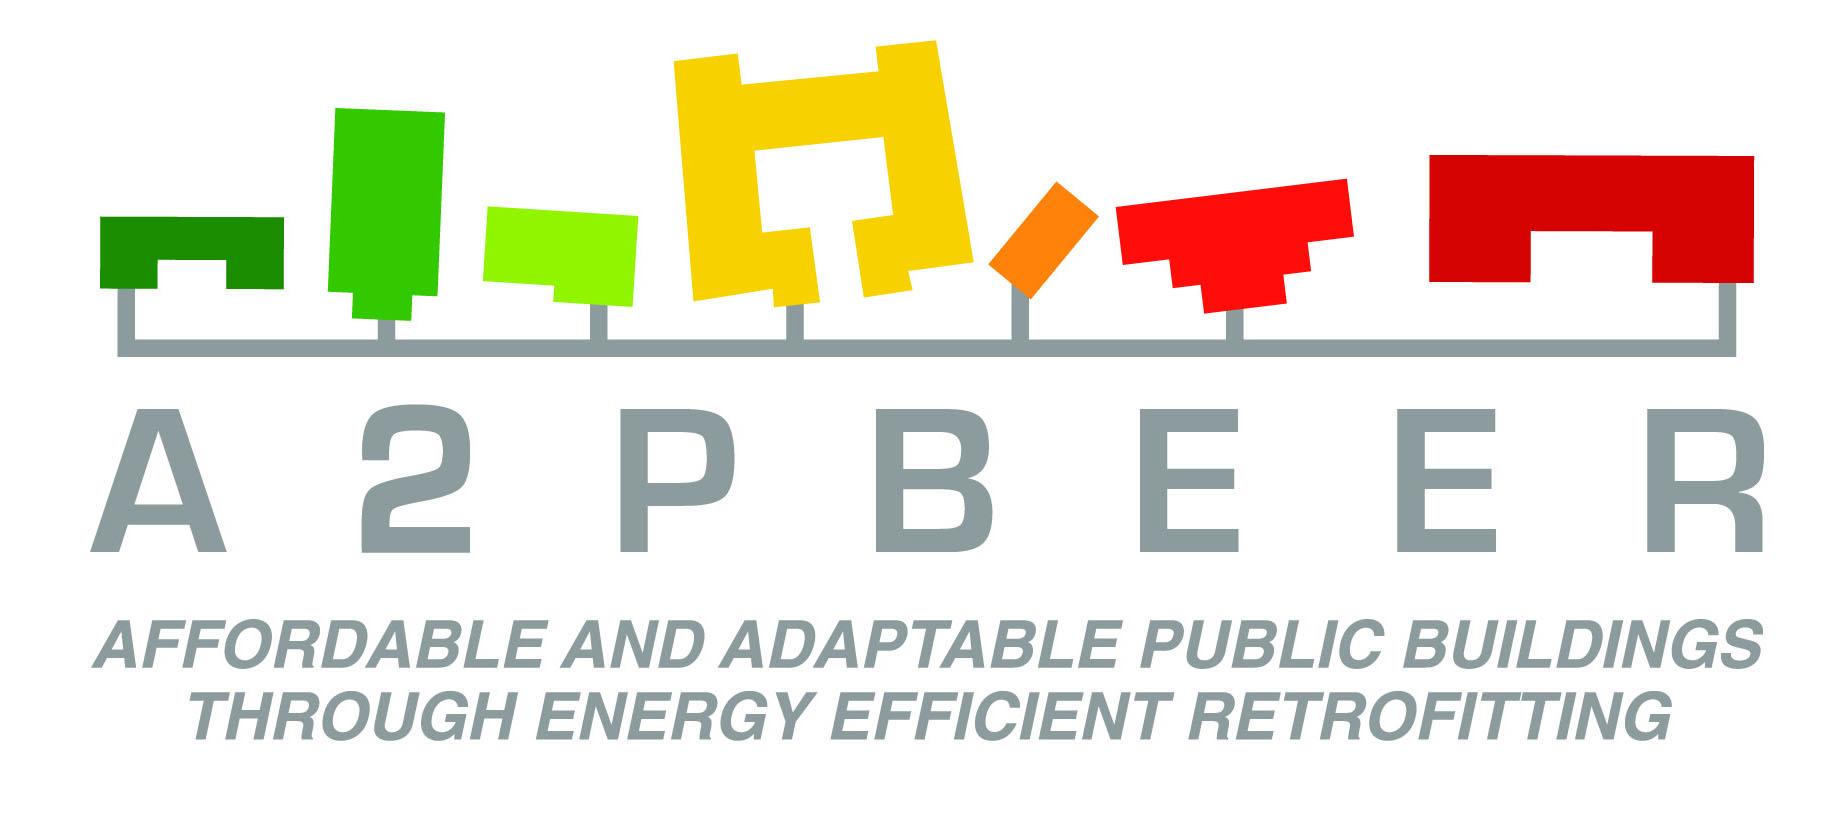 proyectos-europeos-a2pbeer